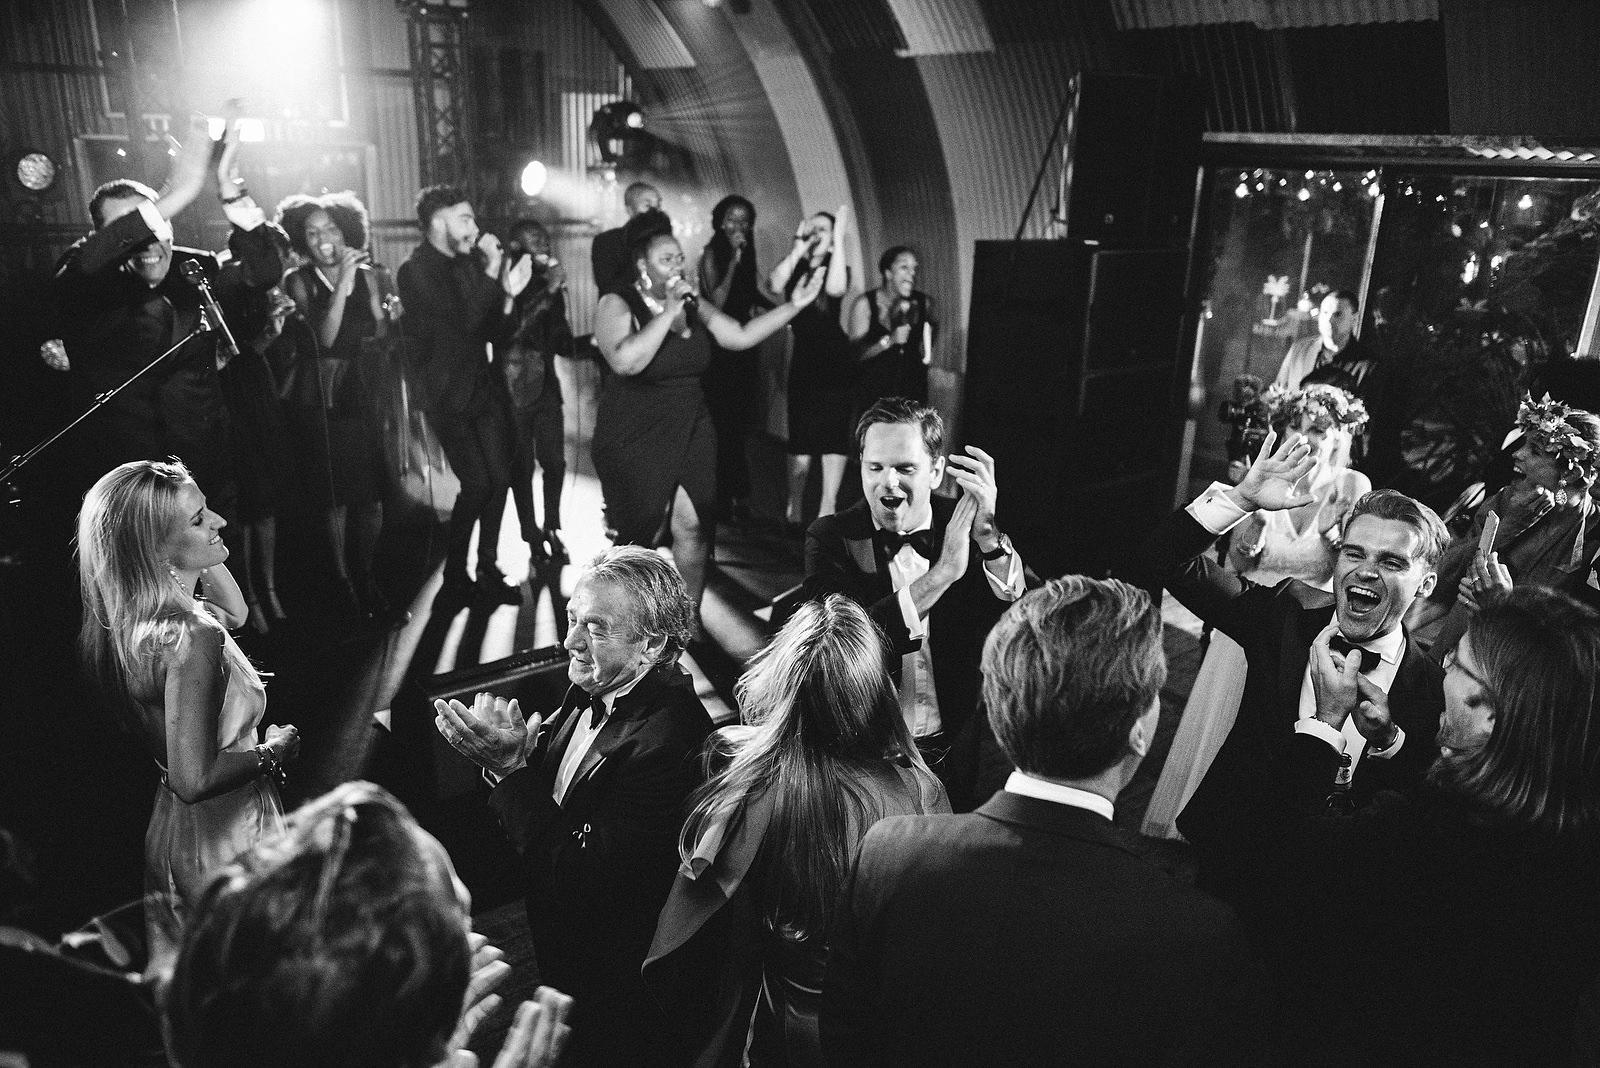 Fotograf Konstanz - Destination Wedding Photographer Amsterdam 127A - Destination Wedding Amsterdam  - 229 -